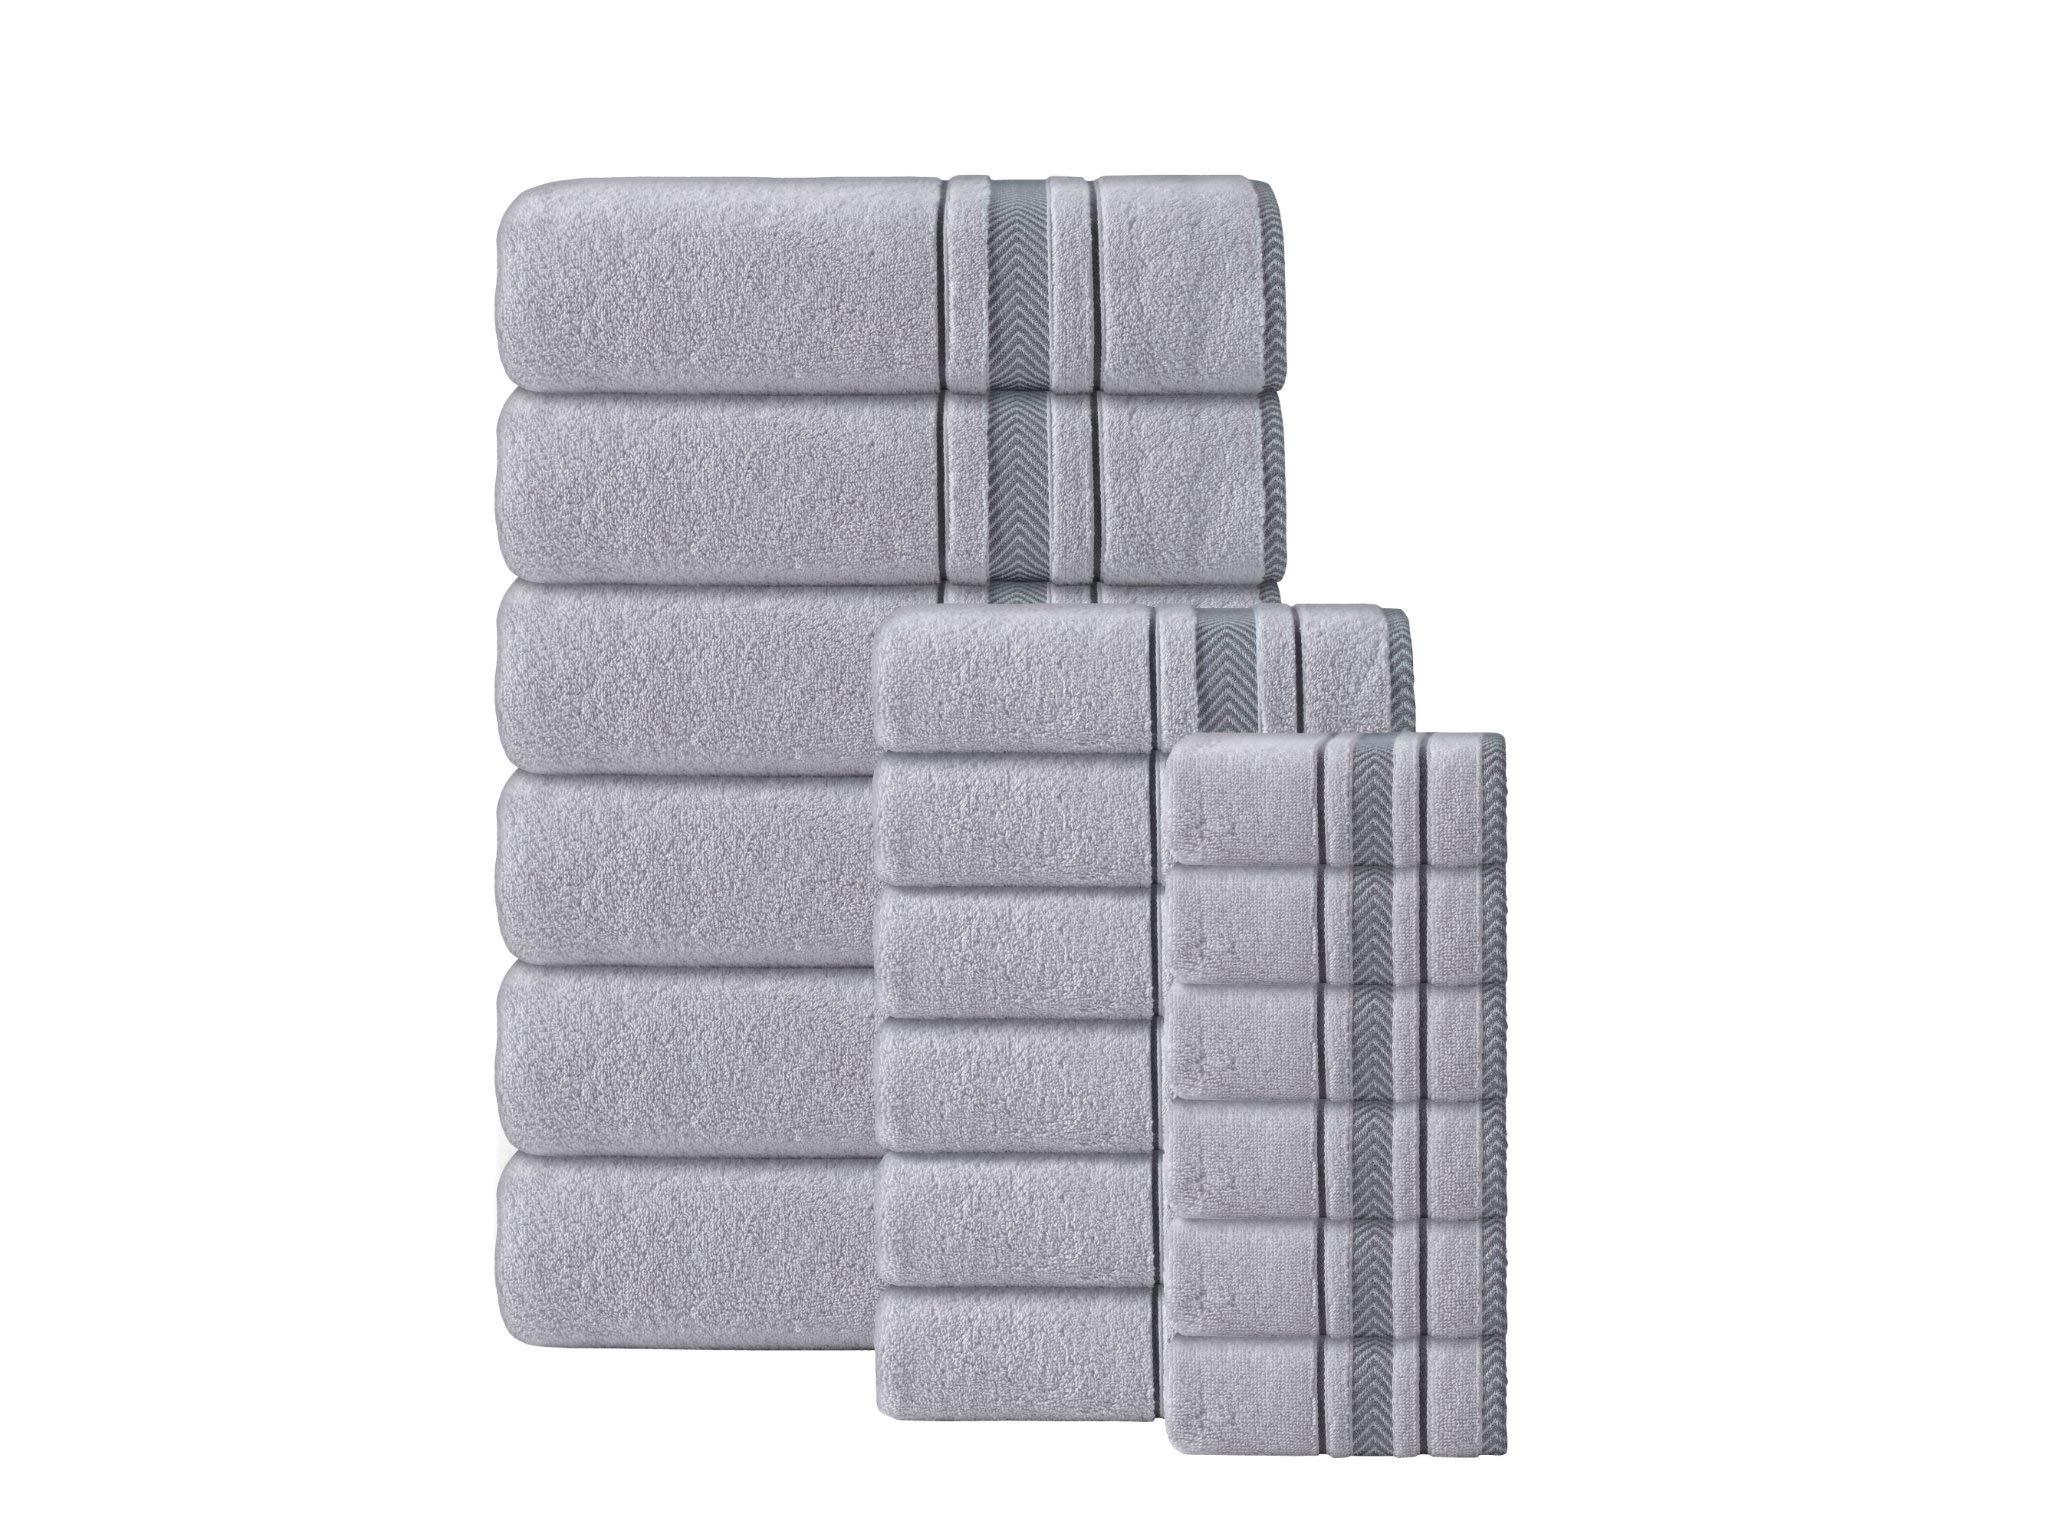 Enchante Home - Enchasoft Turkish Towels - 16 Piece Towel Set, Zero-Twist Turkish Towel - Quick Dry, Soft, Absorbent